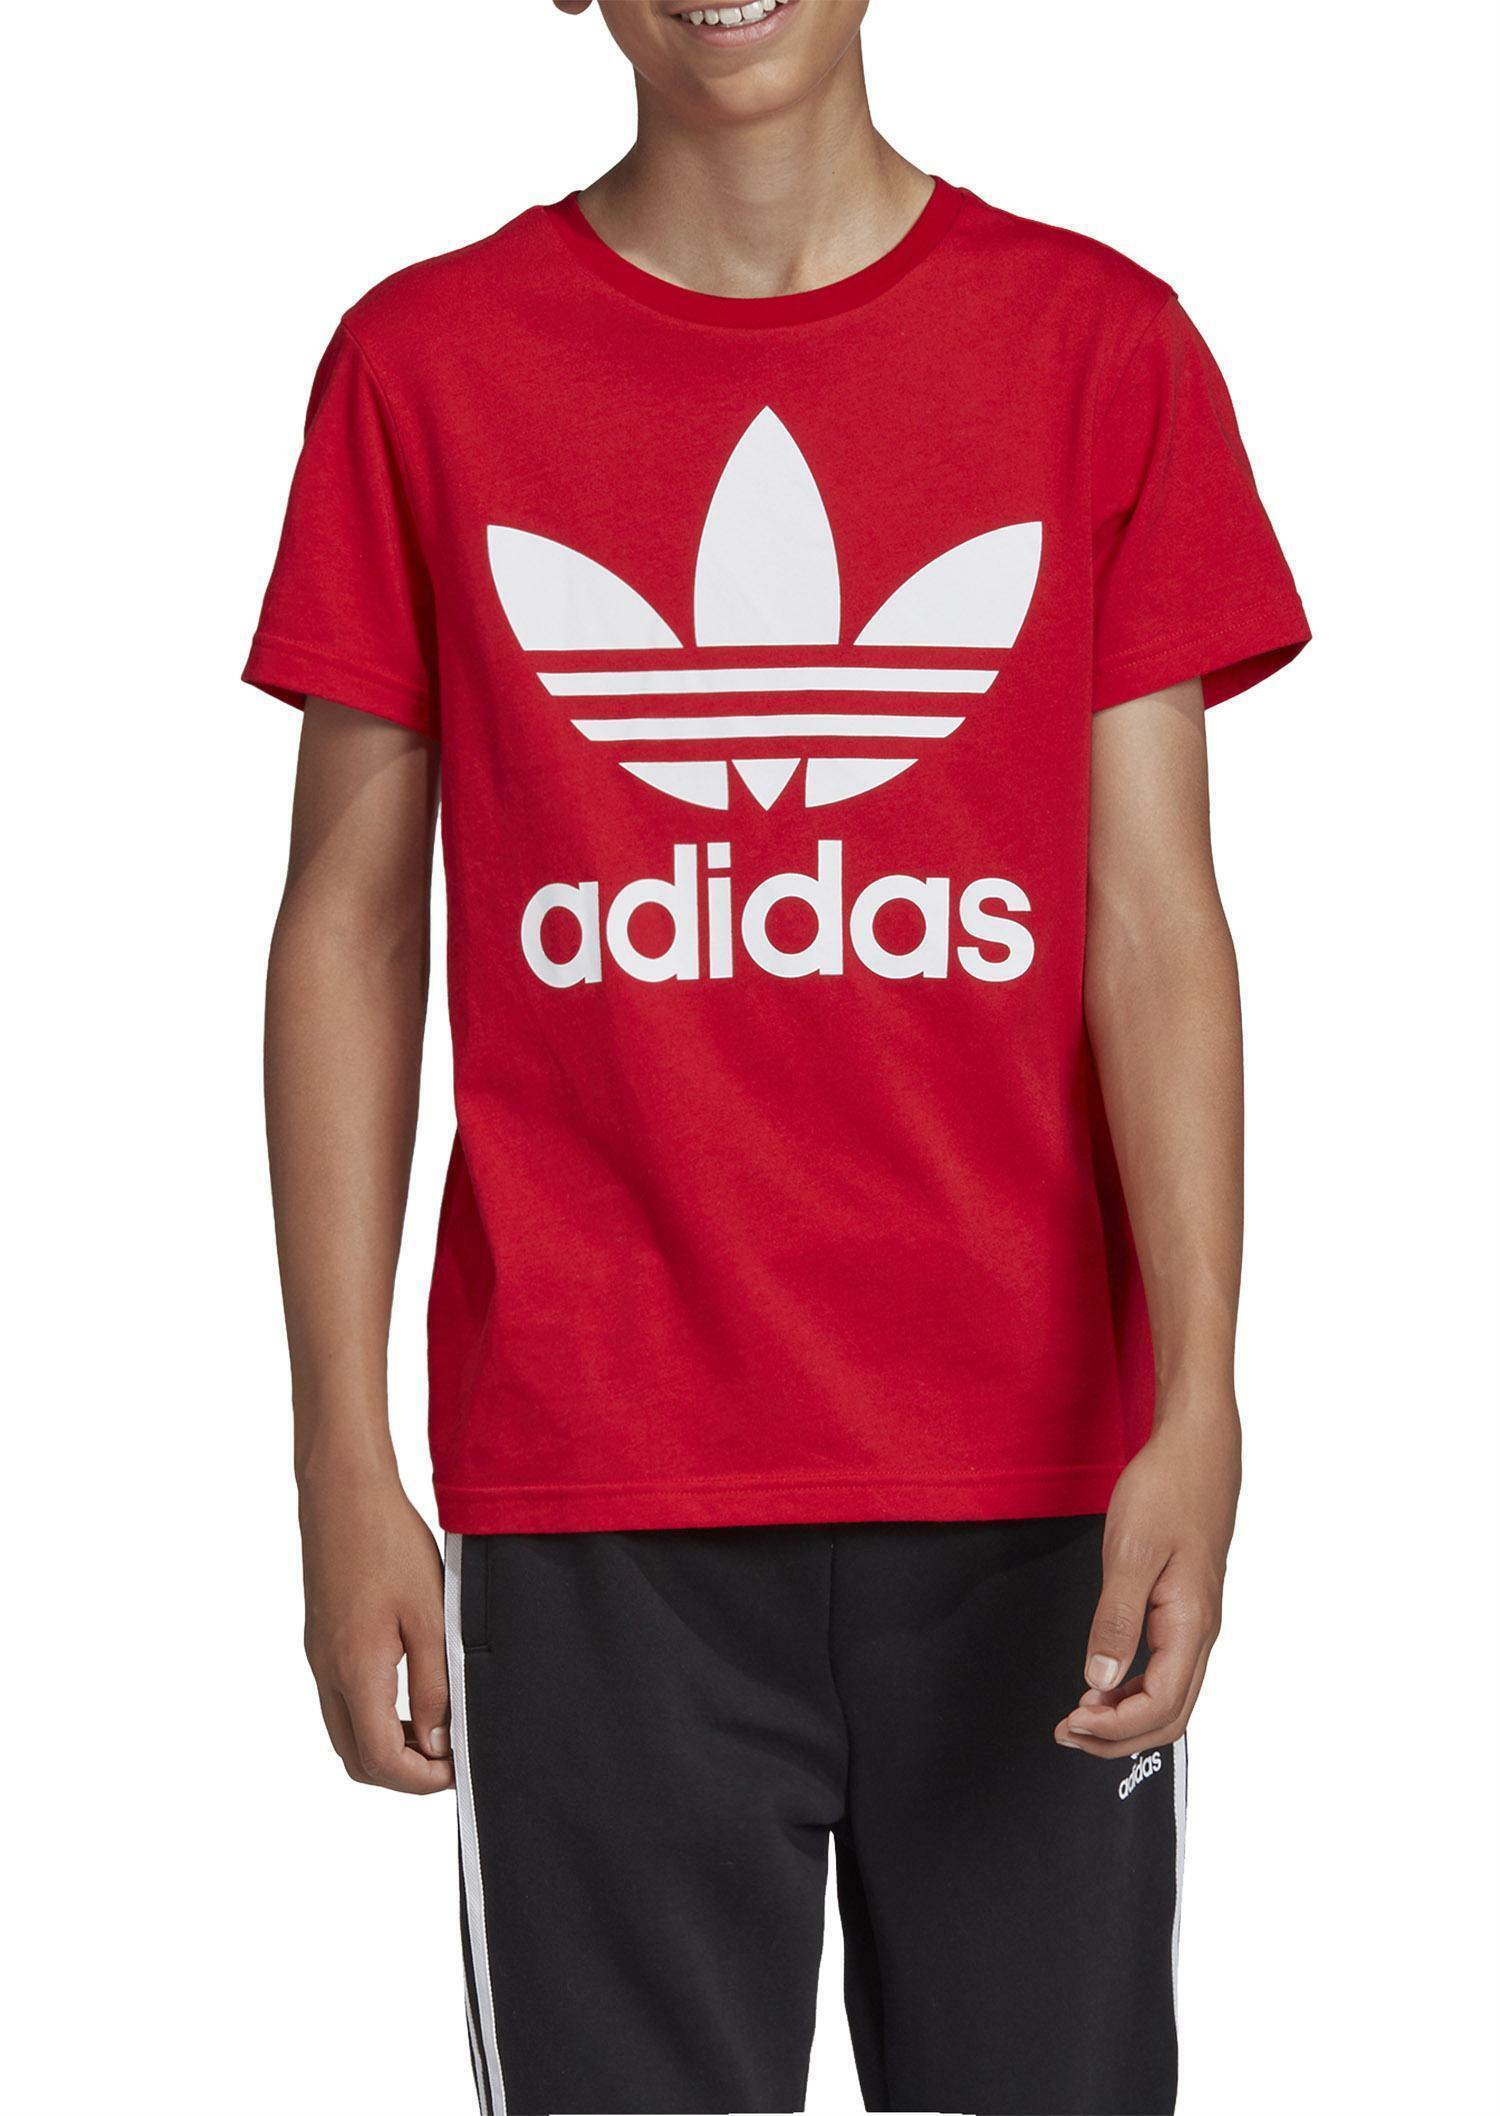 adidas adidas trefoil tee t-shirt bambino rossa ed7795